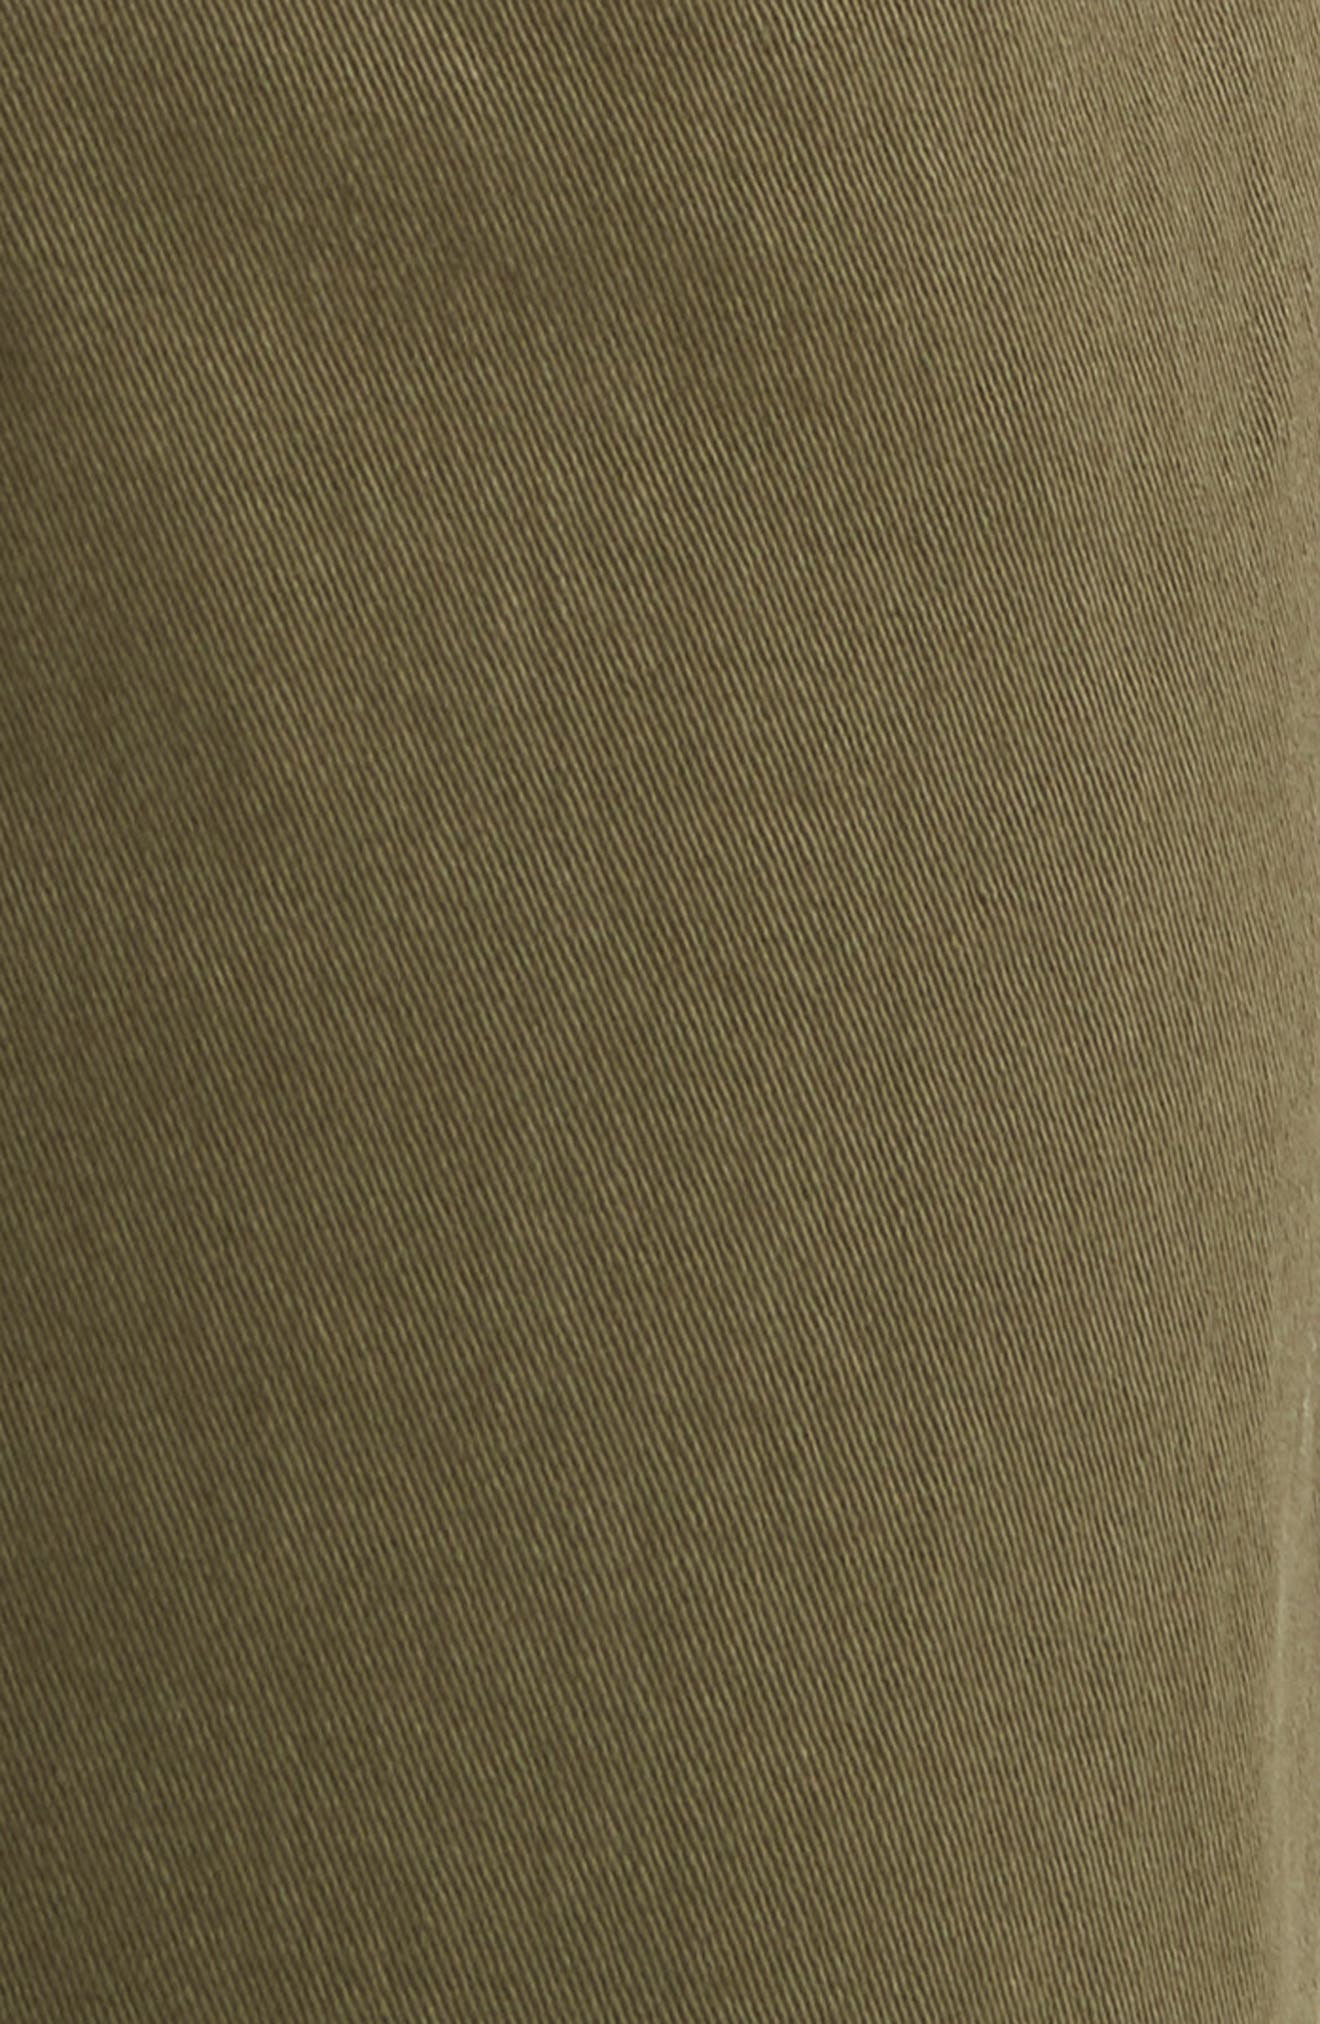 Jeans Co. Kingston Slim Straight Leg Jeans,                             Alternate thumbnail 5, color,                             Olive Night